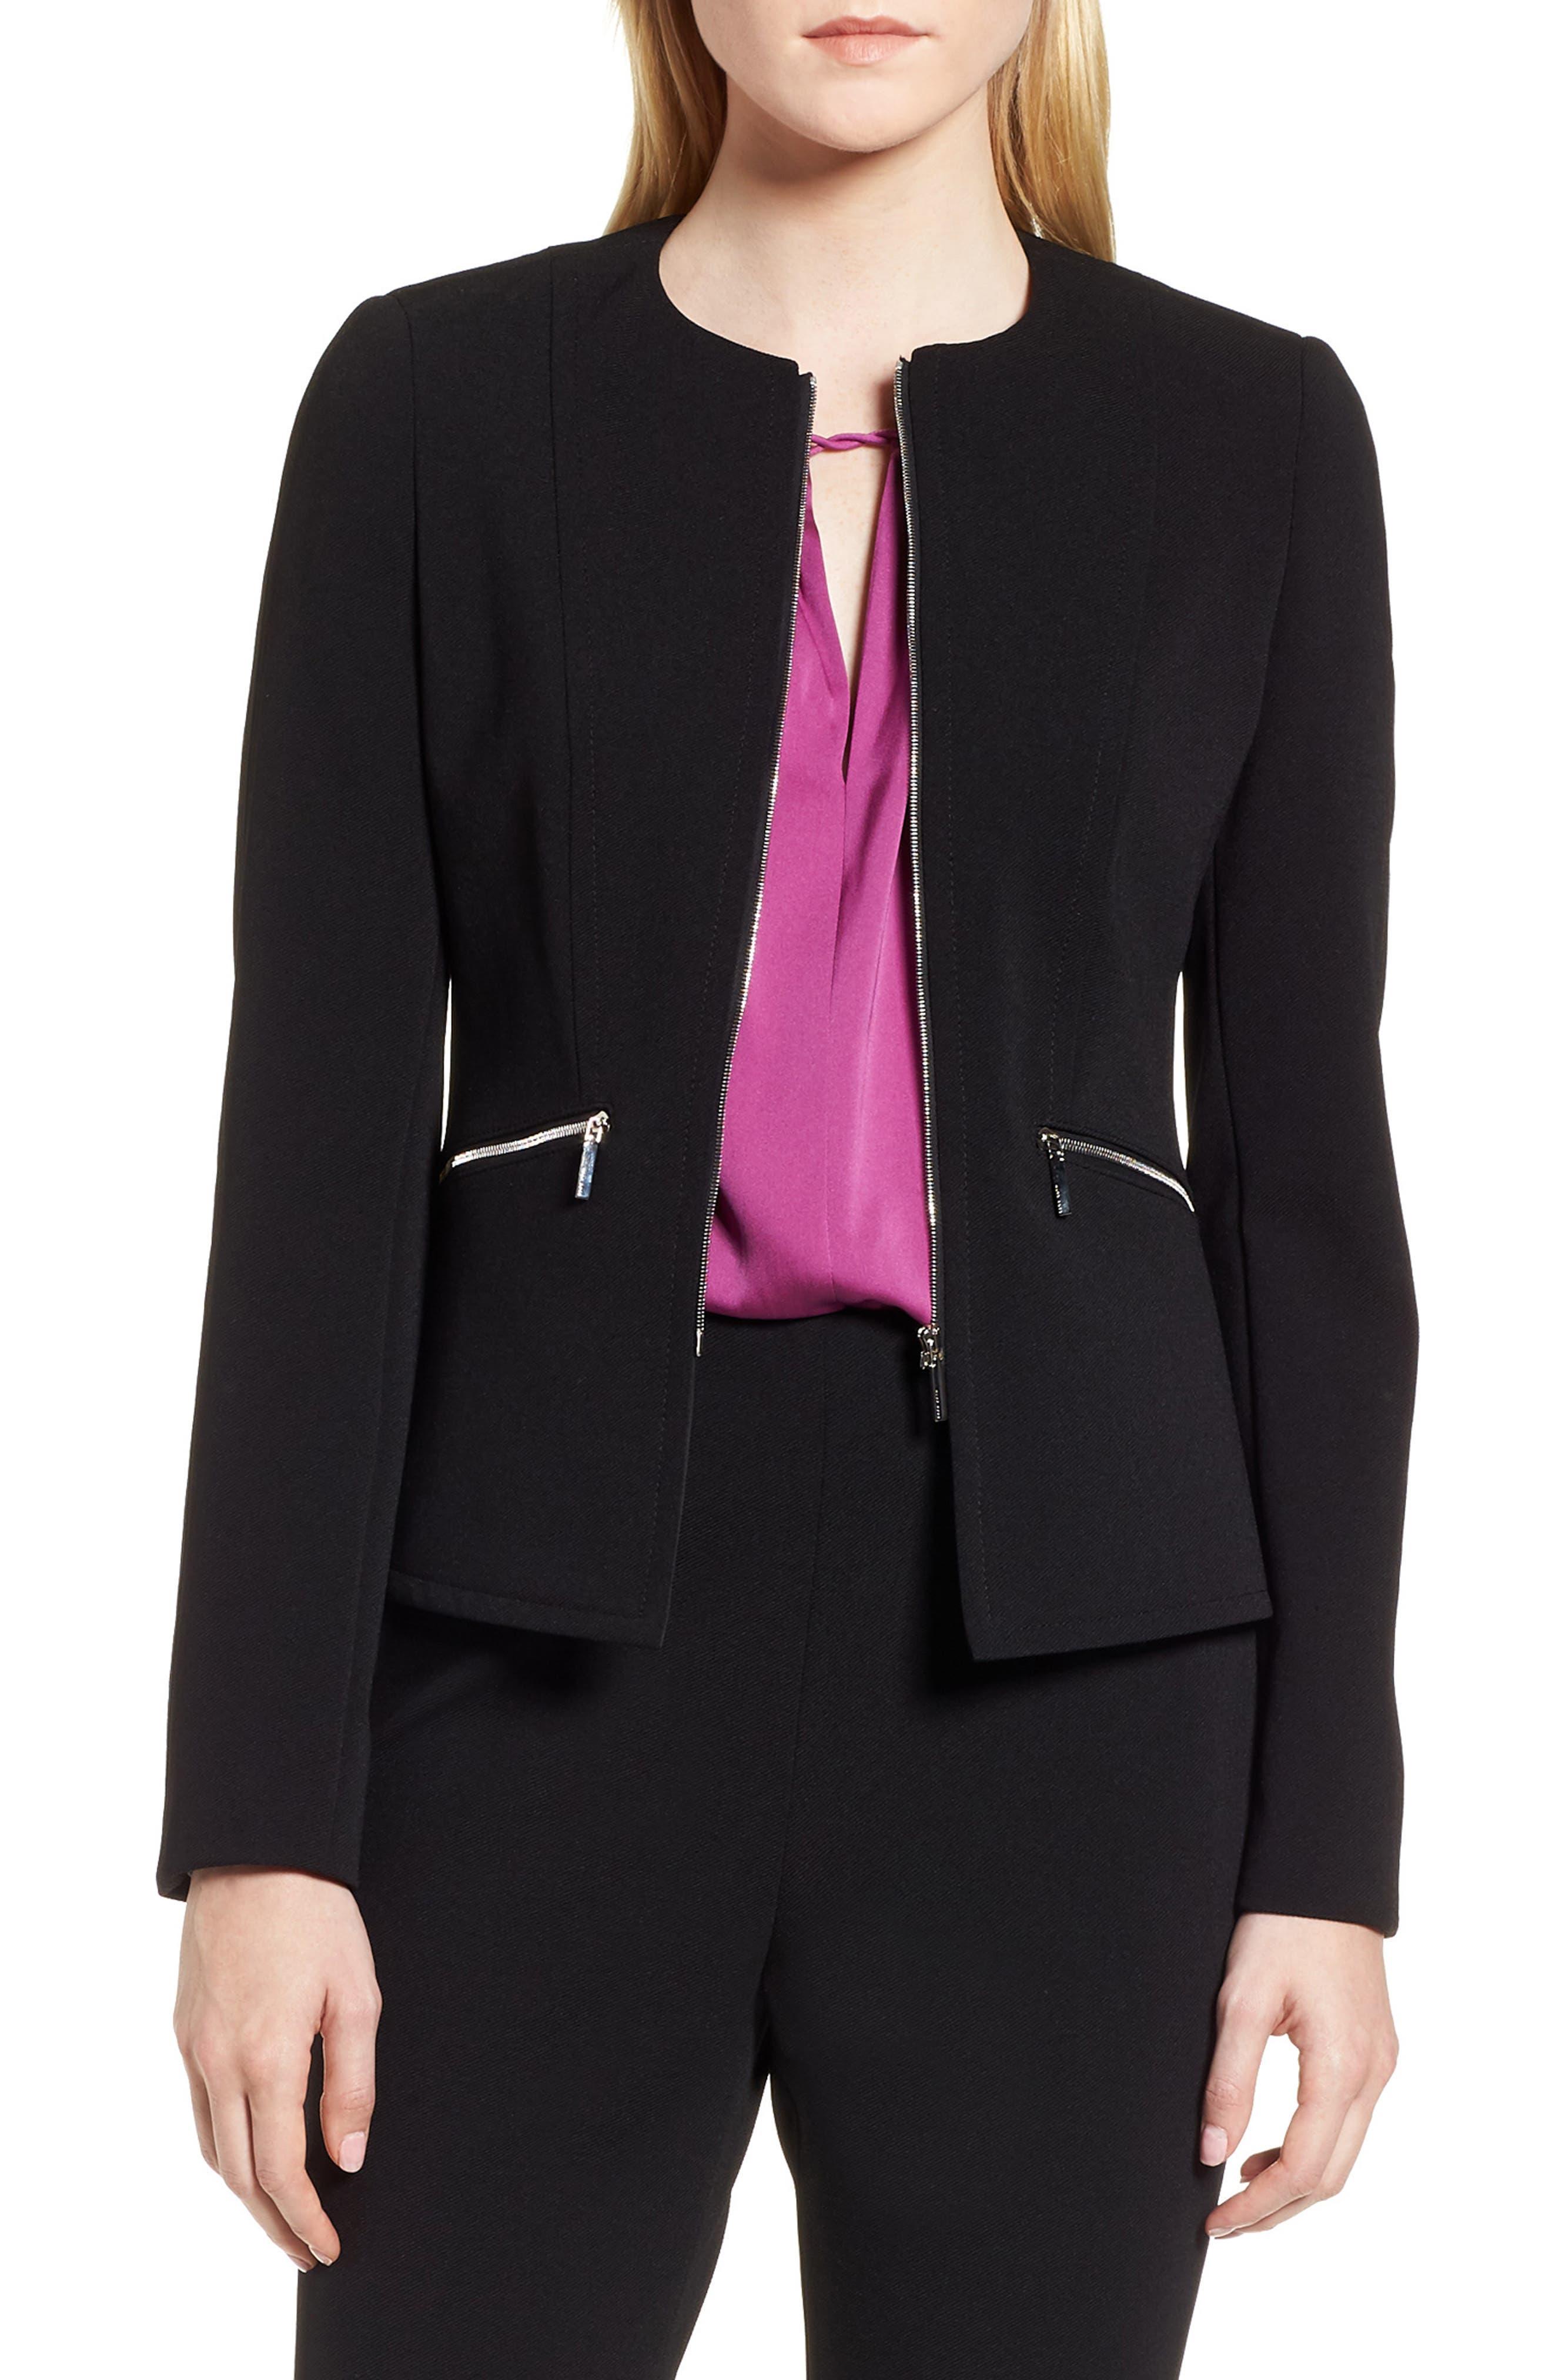 Jazulara Twill Jersey Suit Jacket,                             Main thumbnail 1, color,                             001